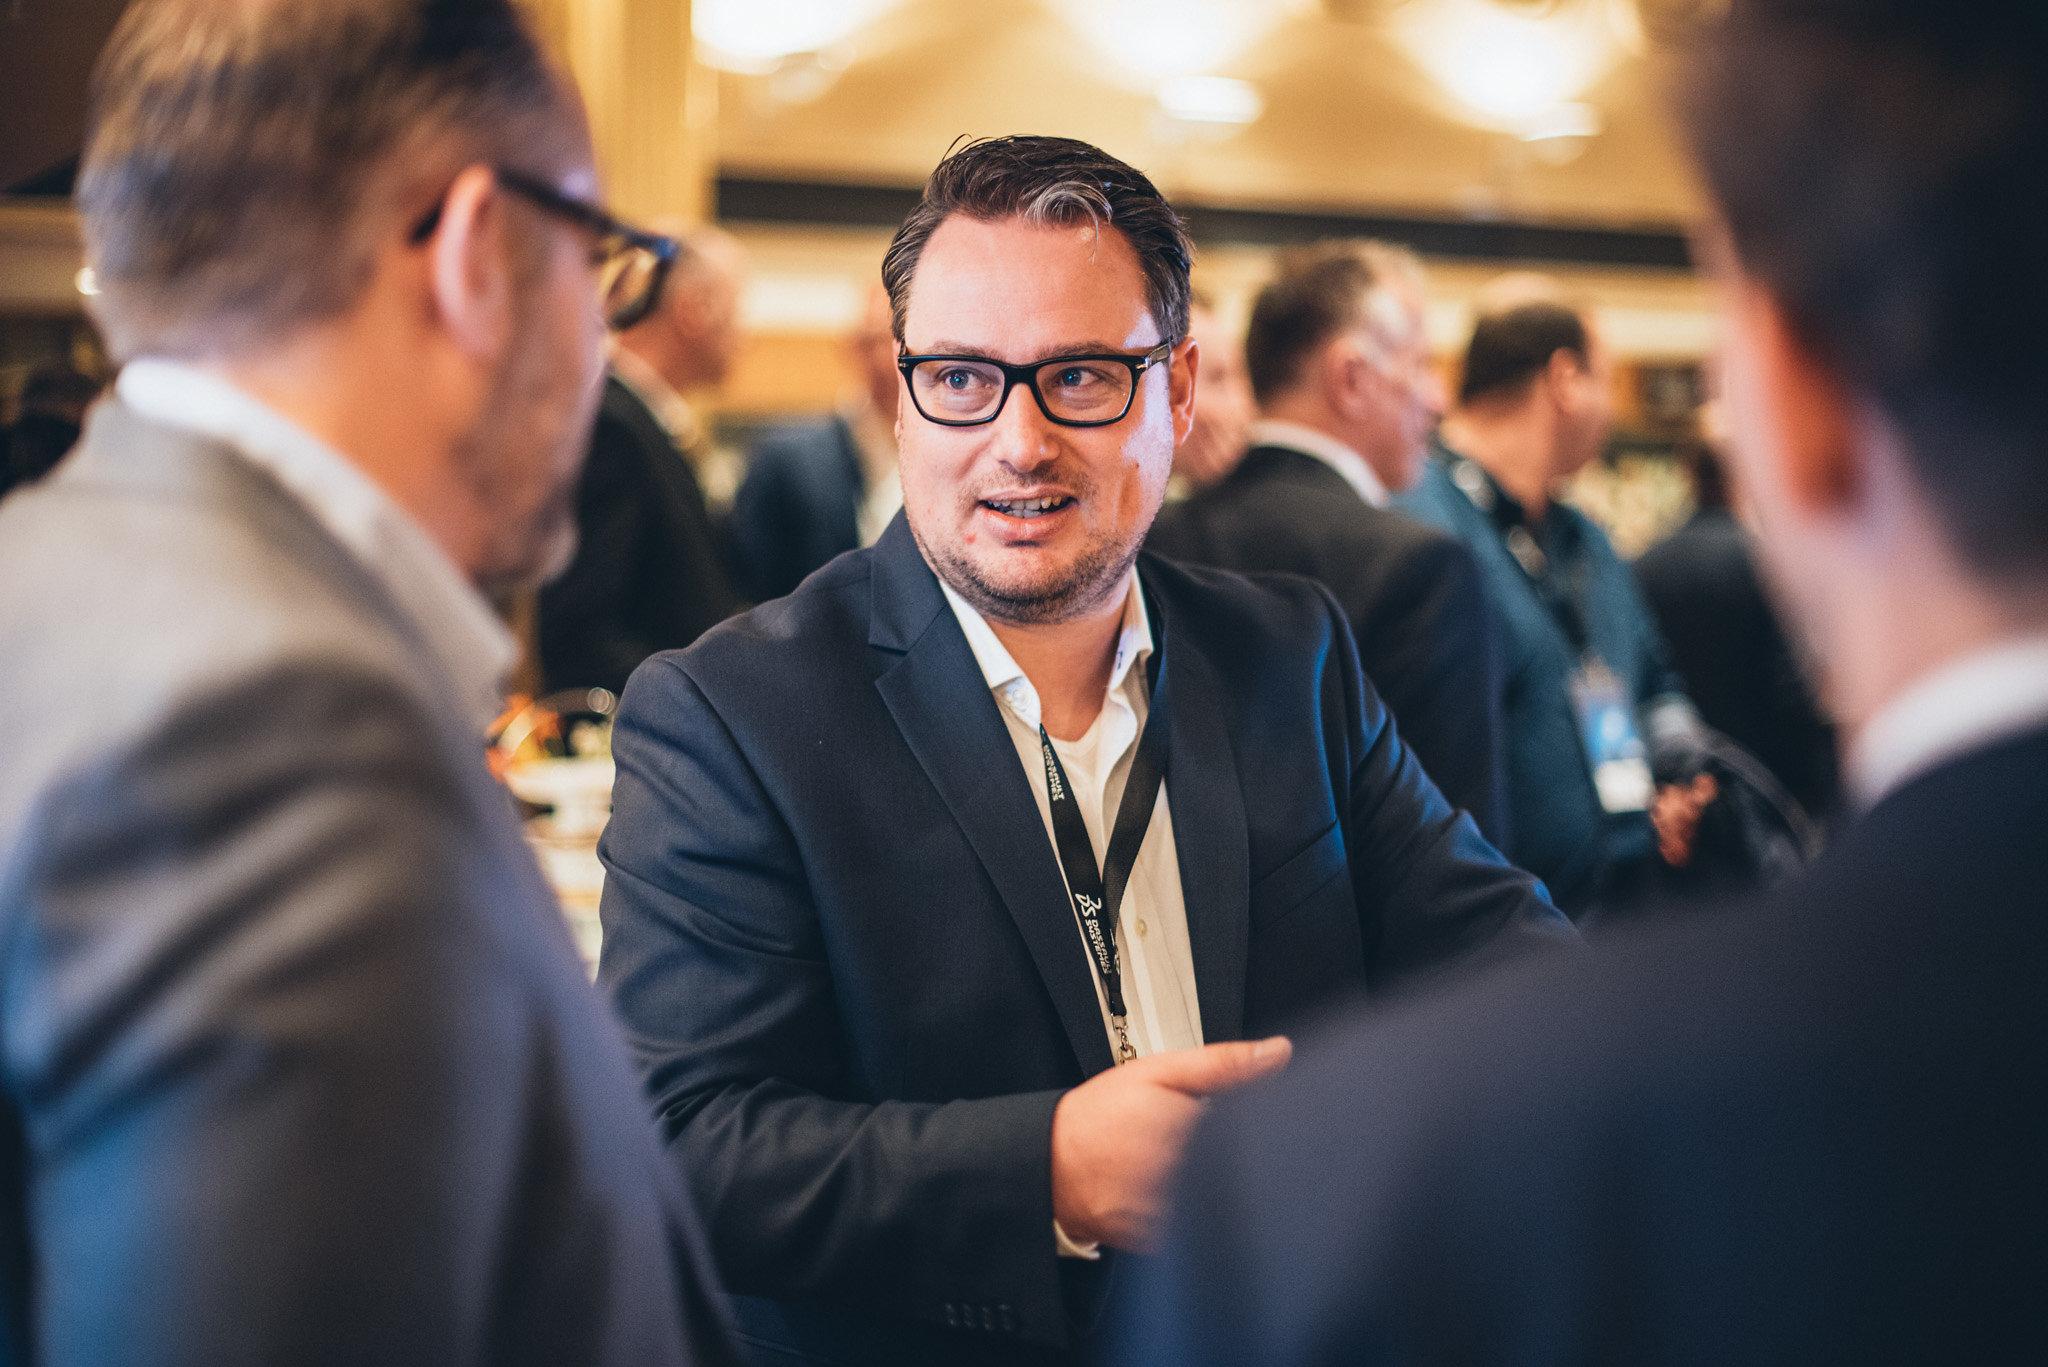 3DX_forum_event_highlights_rotterdam_networking-15.jpg